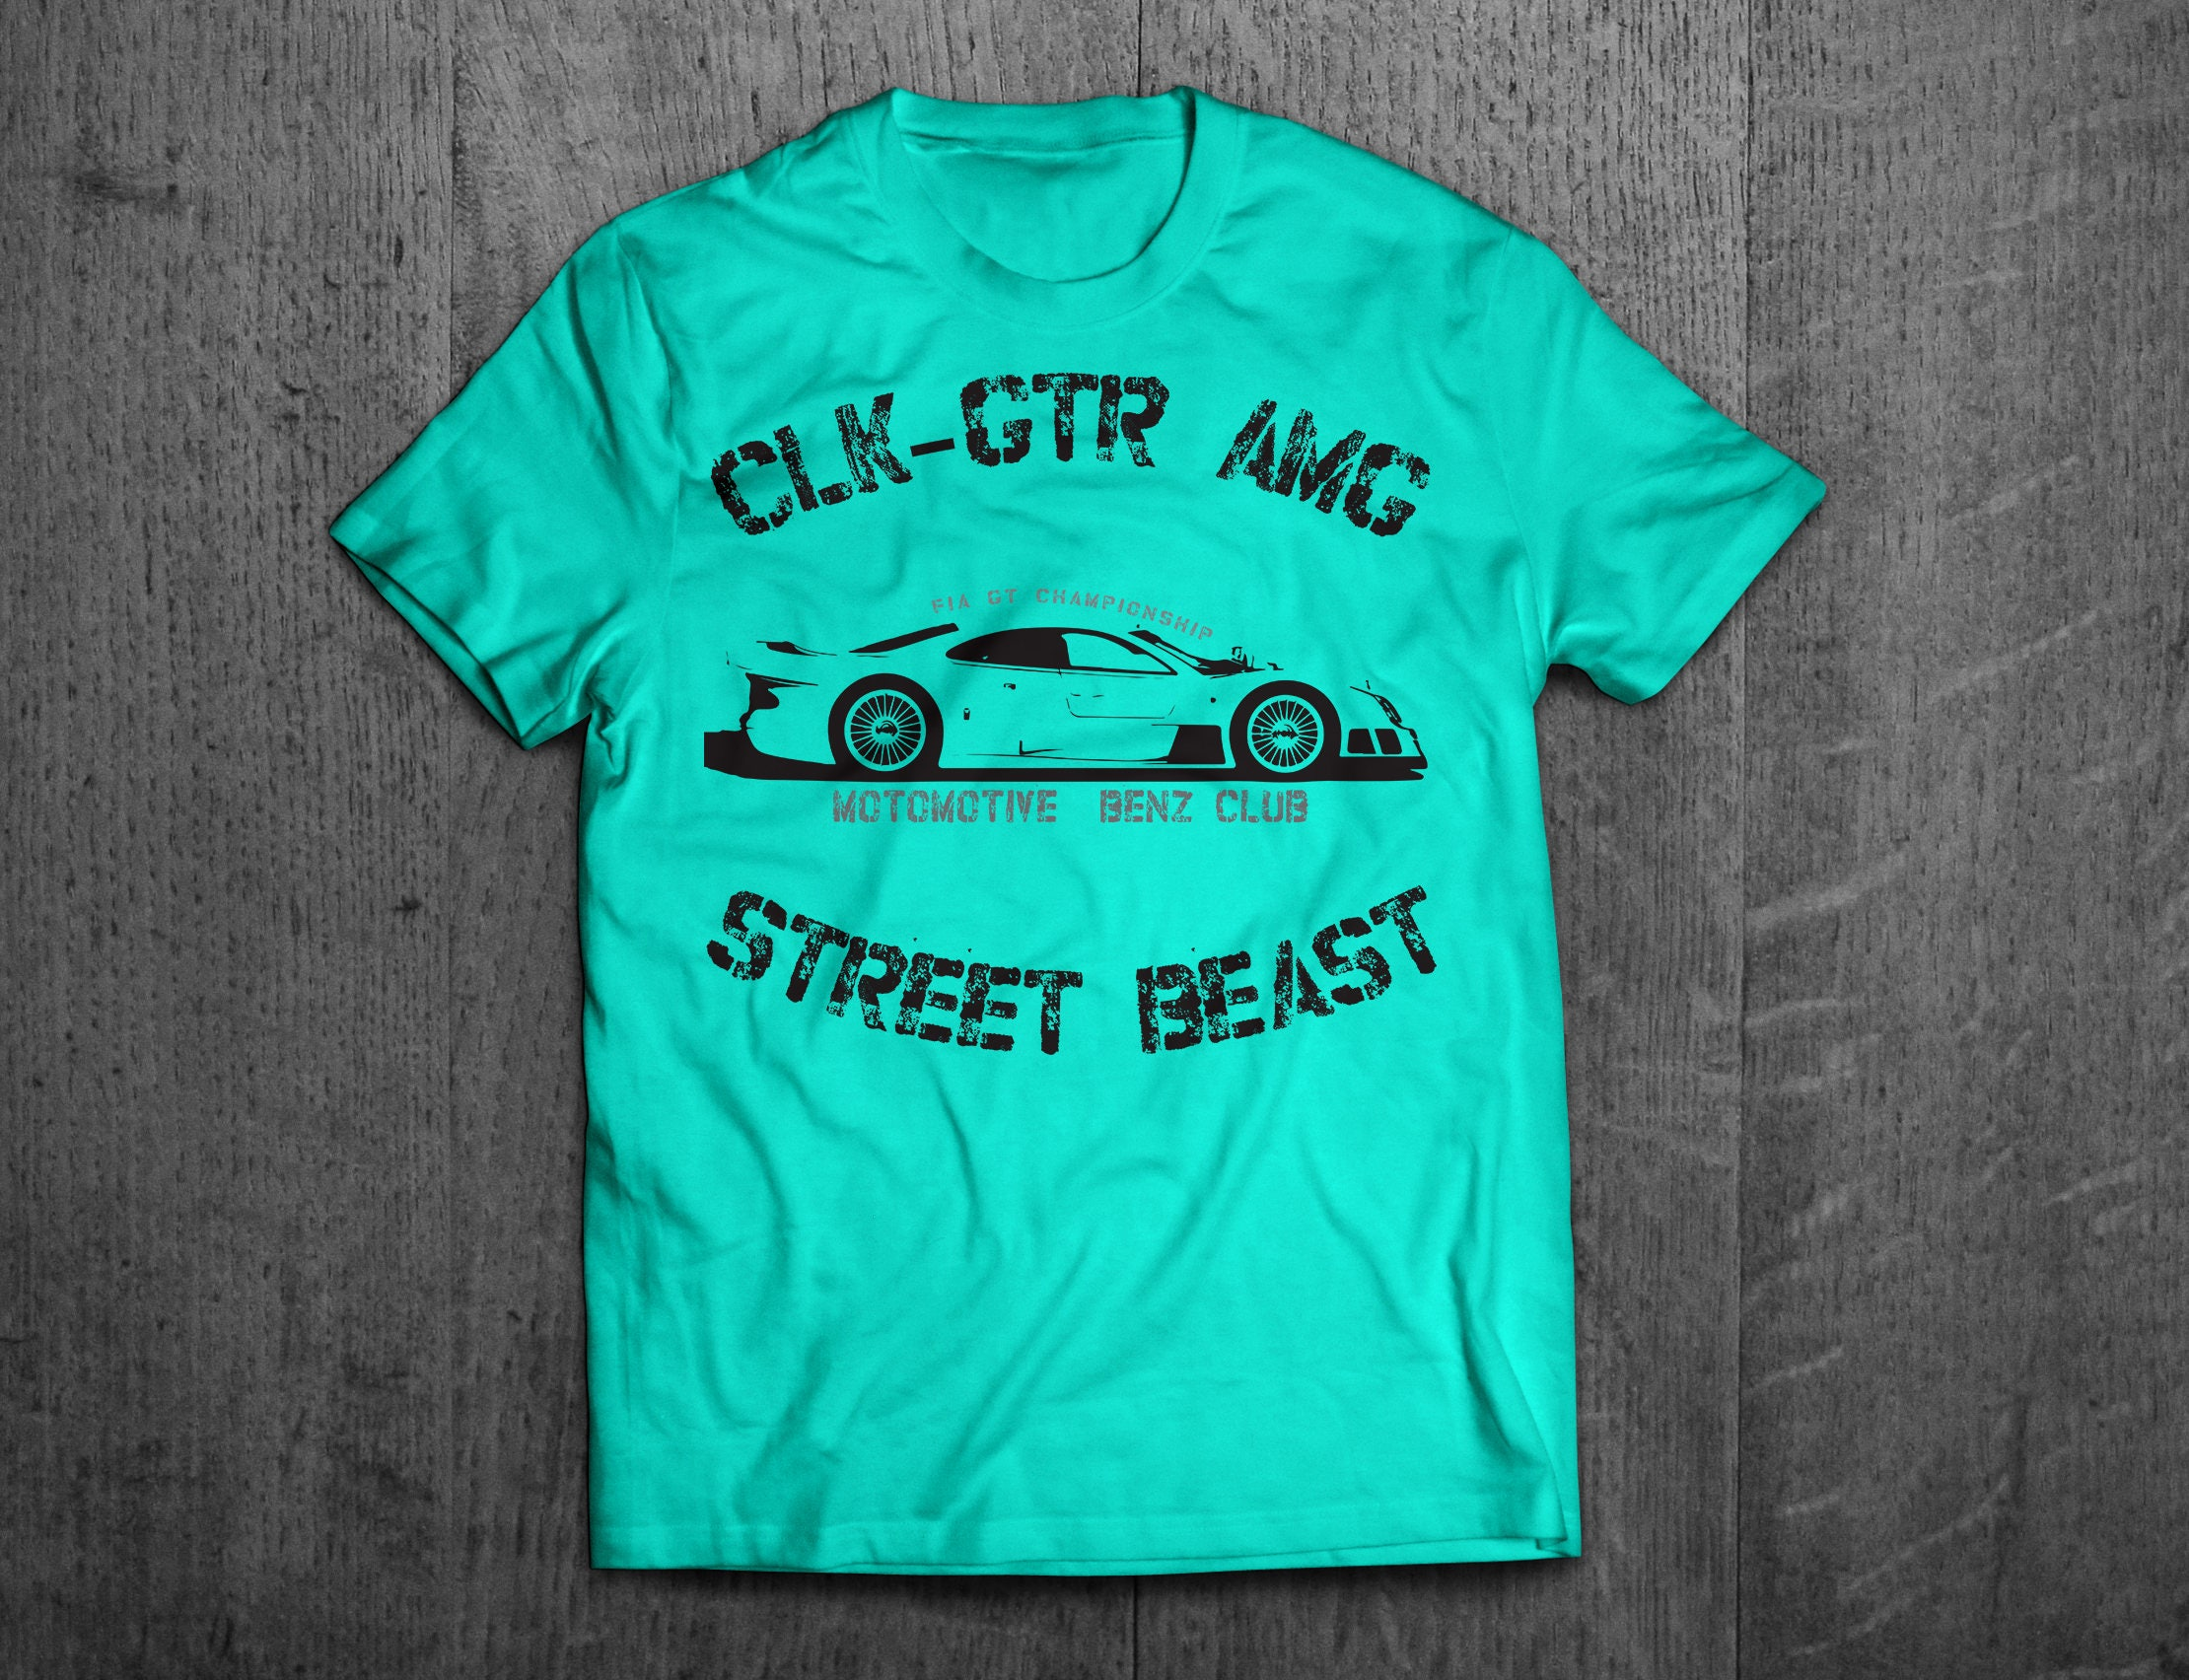 mercedes amg shirts mercedes clk gtr t shirts cars t shirts men t shirt women t shirt funny. Black Bedroom Furniture Sets. Home Design Ideas